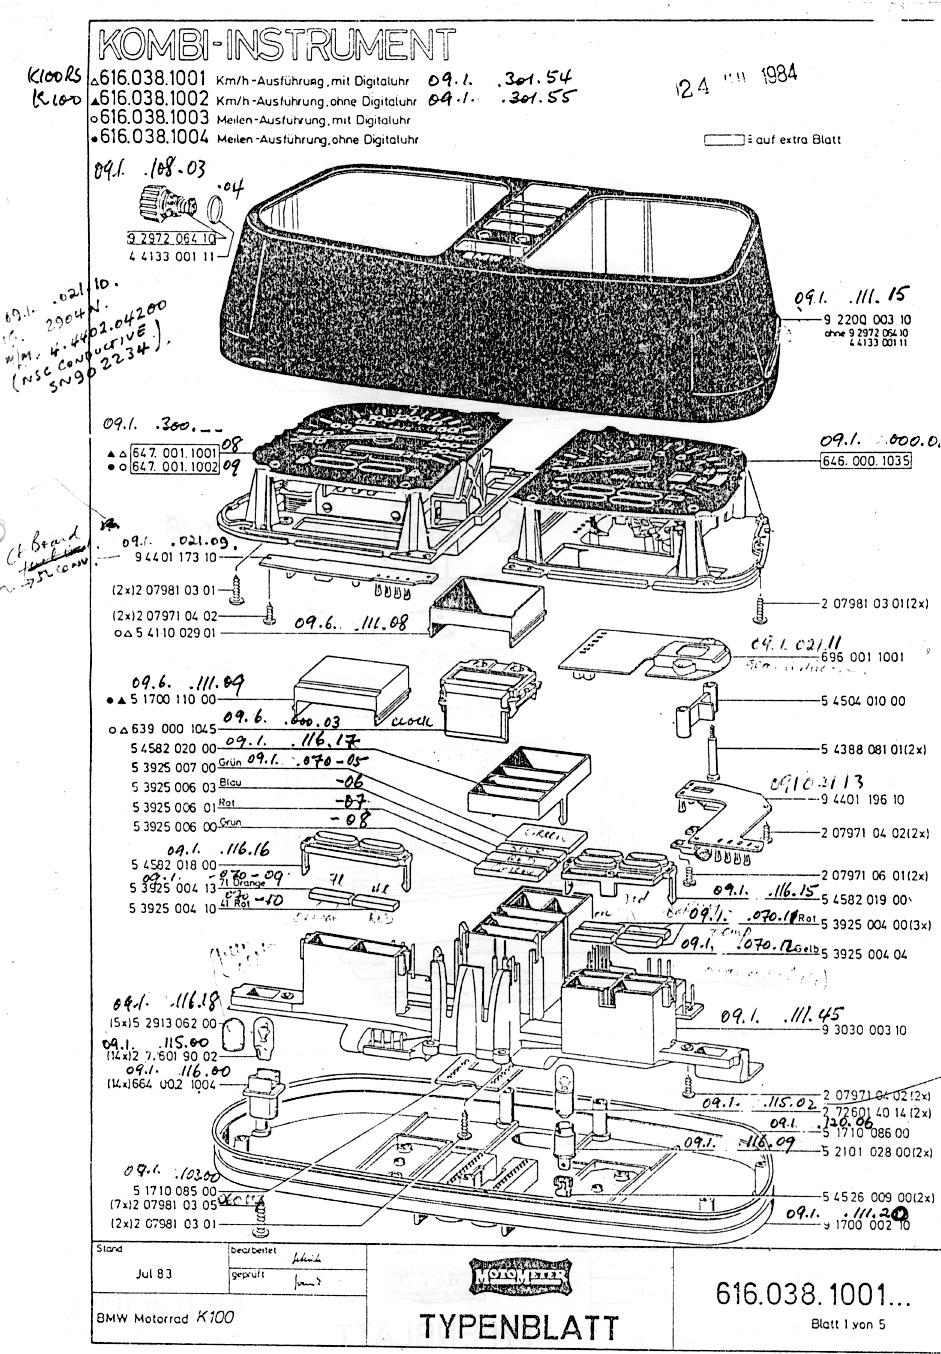 medium resolution of wrg 0912 wiring diagram bmw k1200 bmw k 1200 wiring diagram